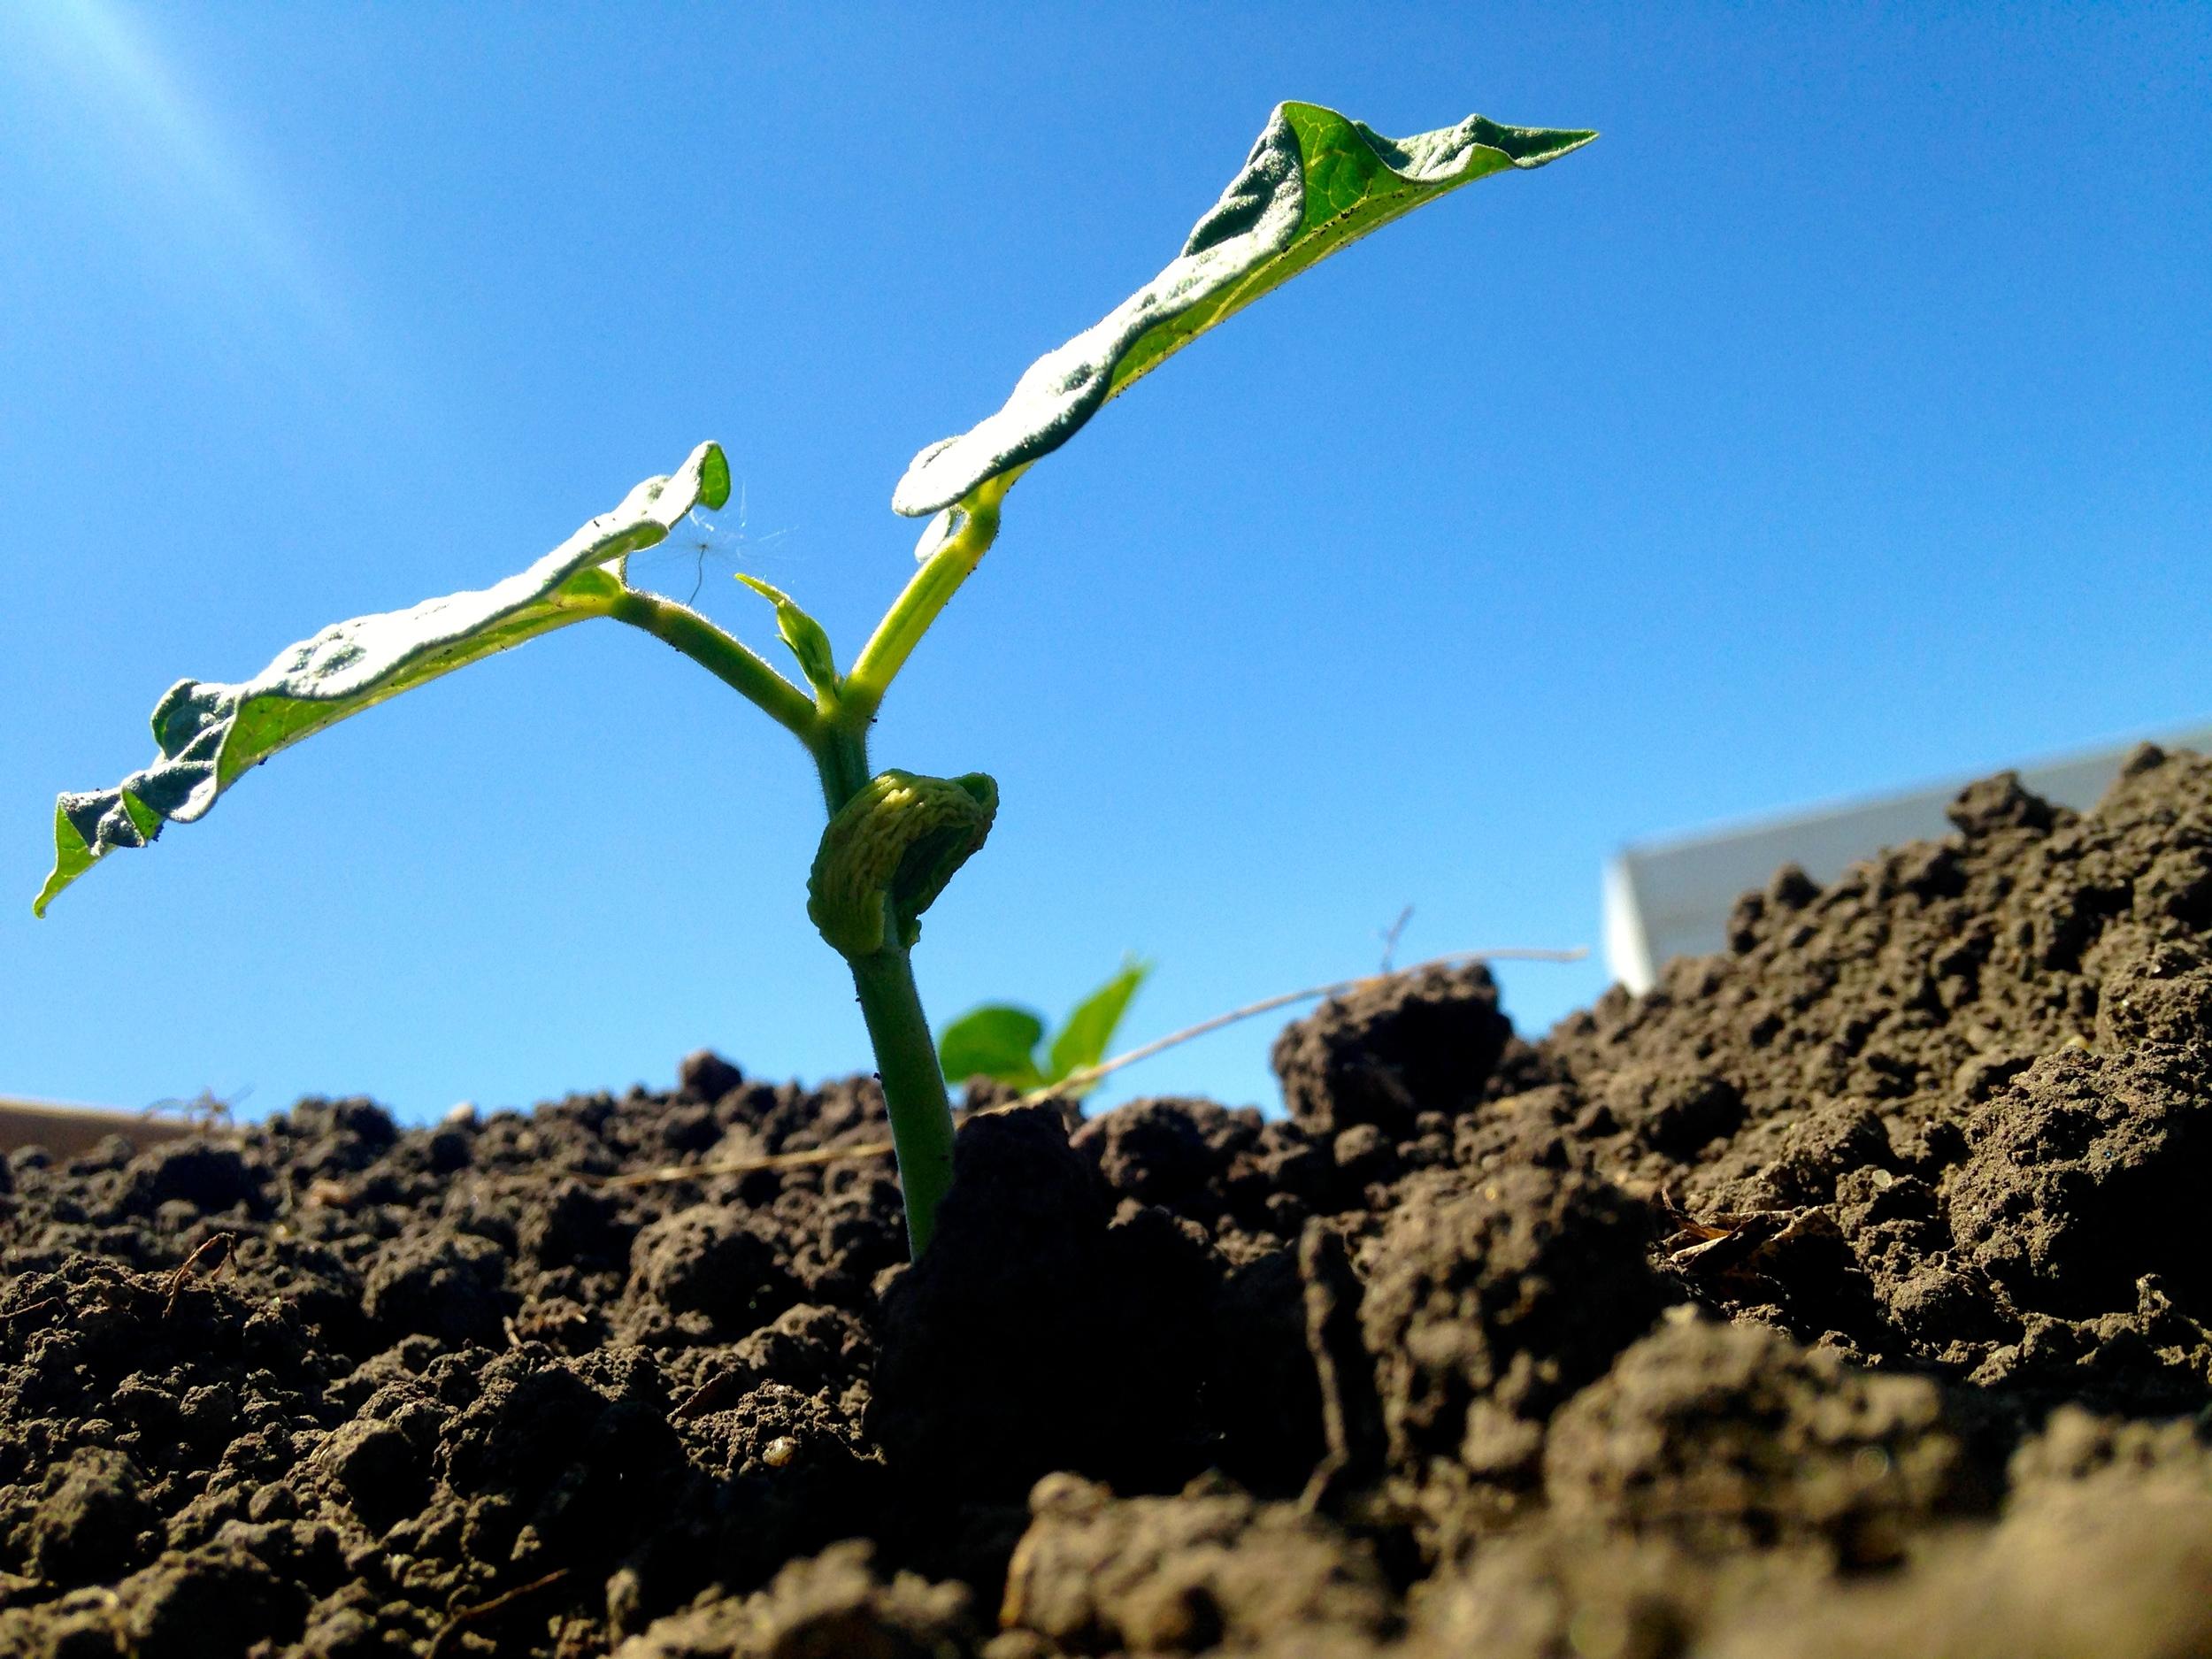 Beans growing in the La Plant community garden (A.Gross,June 2014)